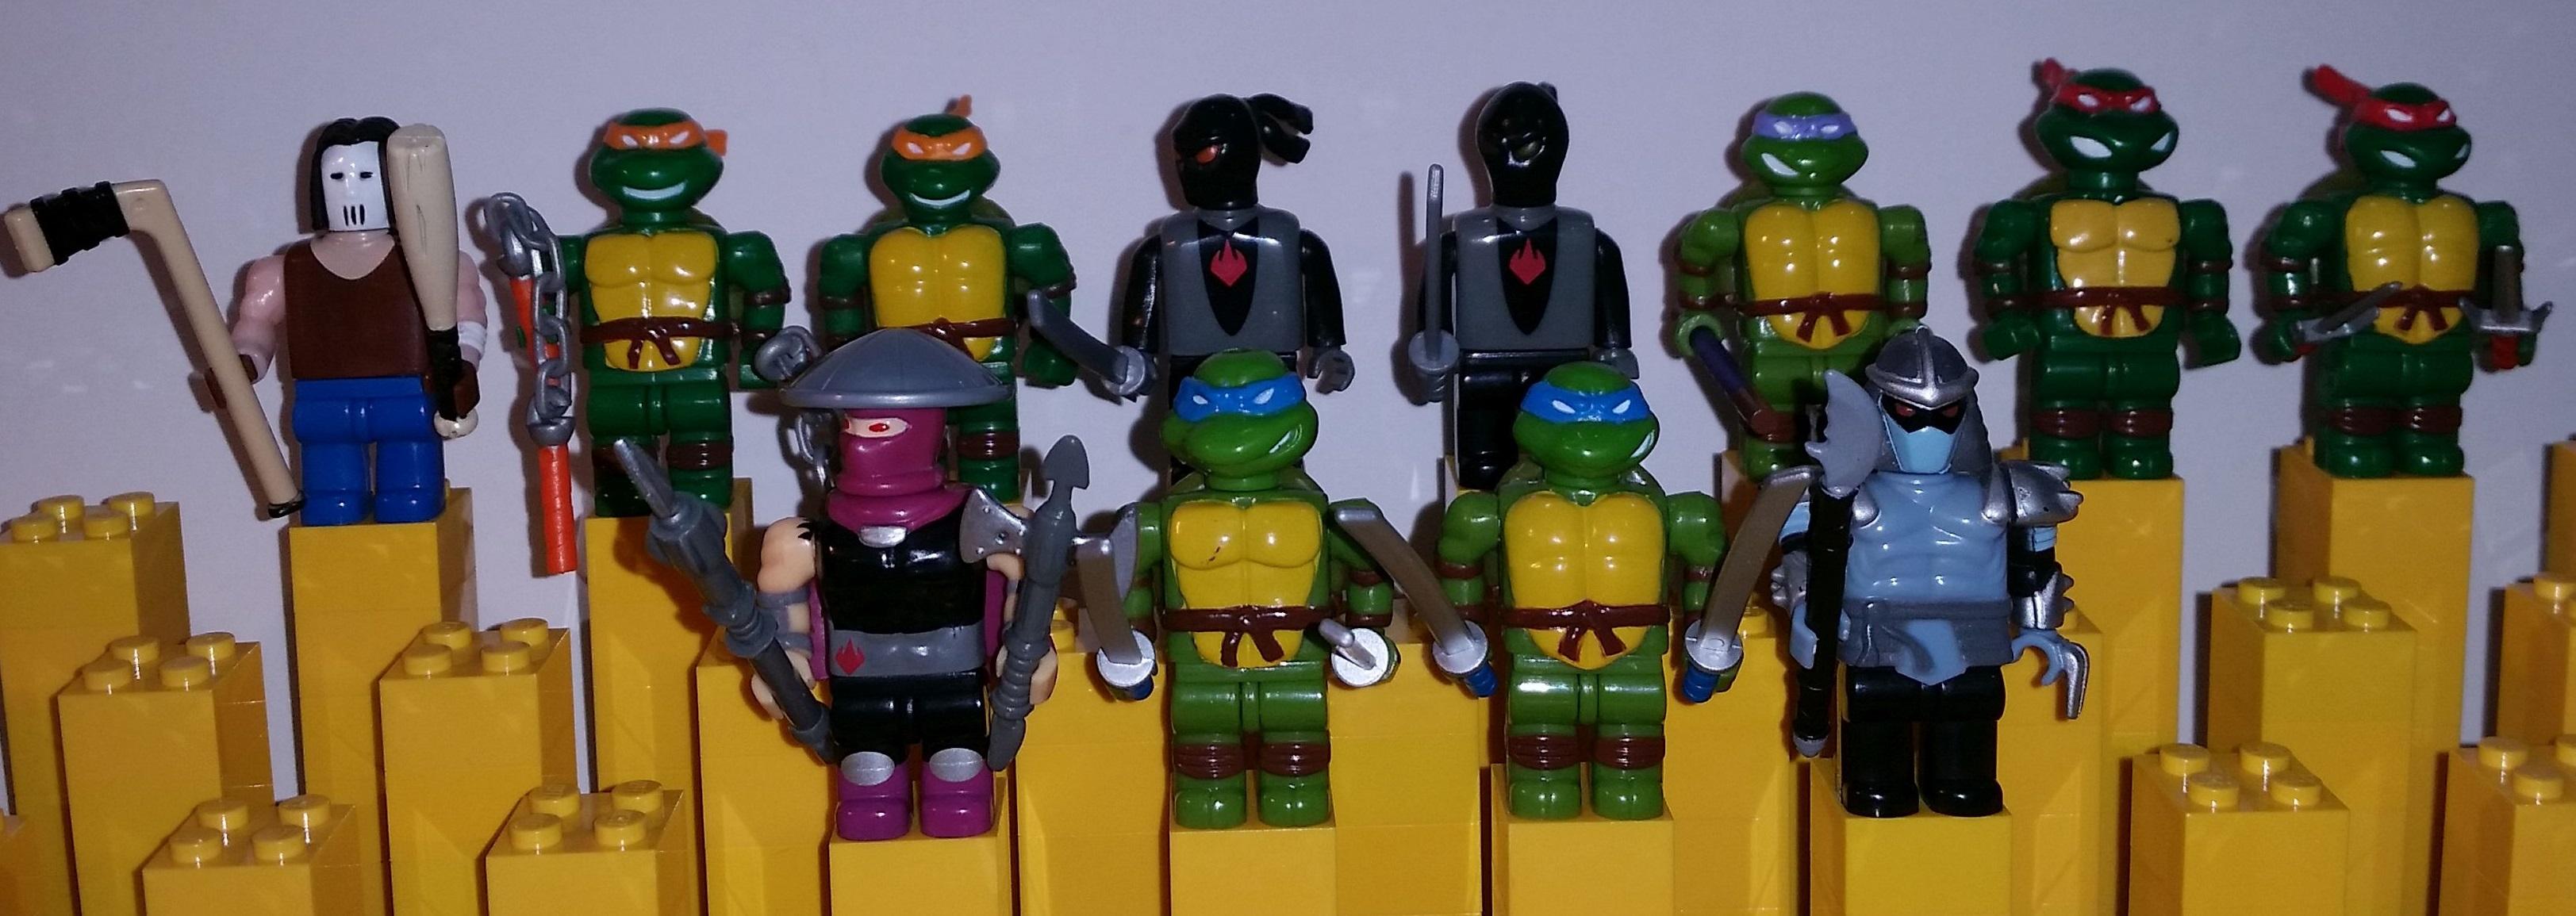 Complete Collection Of All Original Mega Bloks Teenage Mutant Ninja Turtles Megabloks From Early 2000 S Minifigure Price Guide